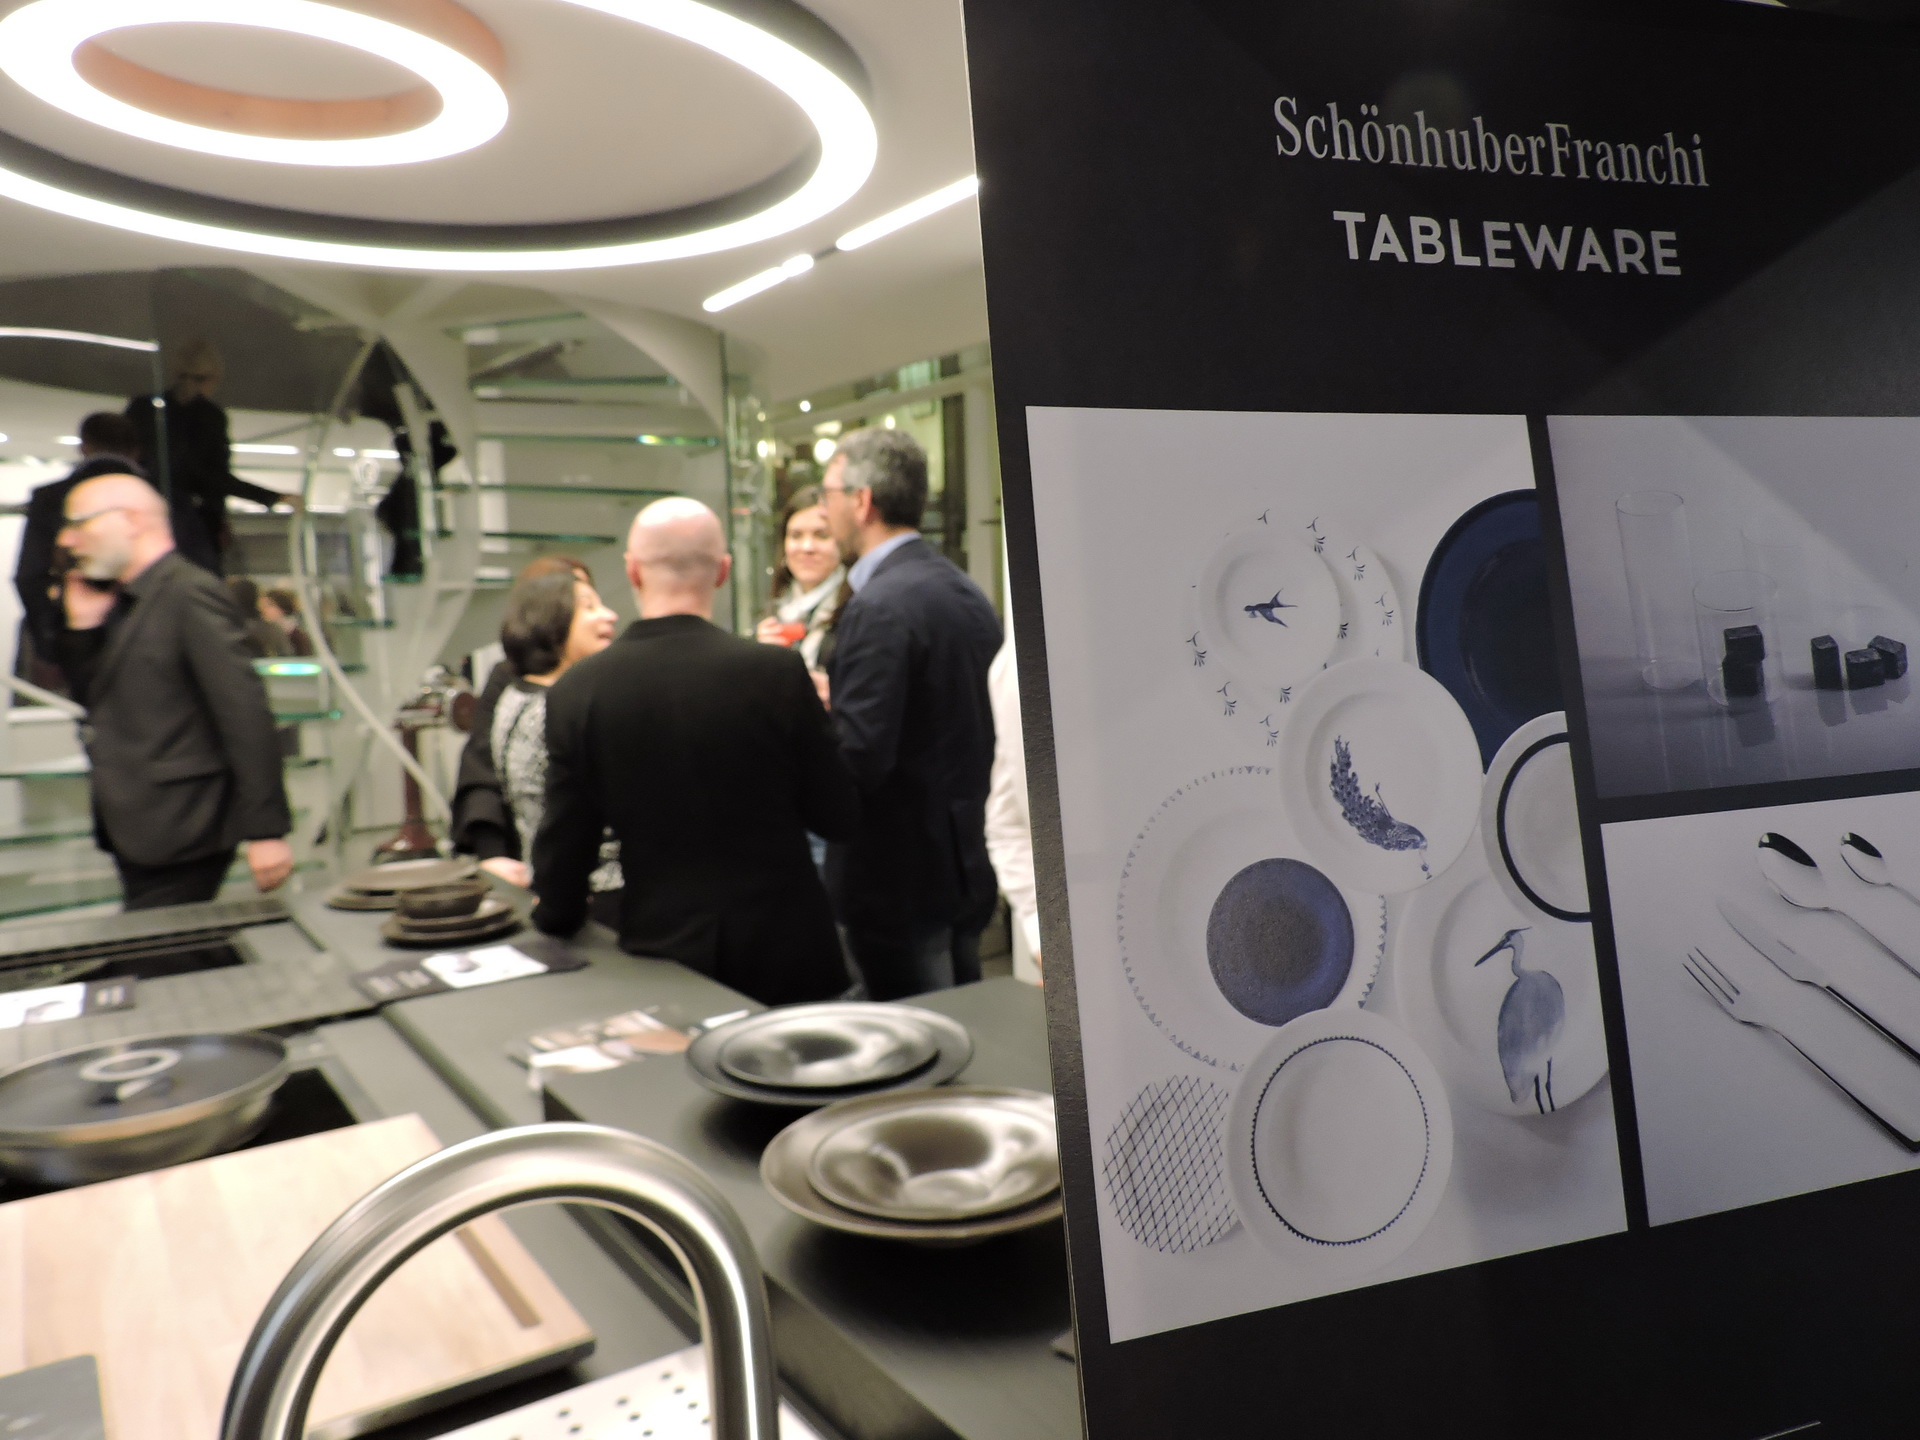 Fuorisalone 2017 - Desing Week 2017 - Binova Milano - cocktail con Davide Oldani e Schonhuber Franchi 013